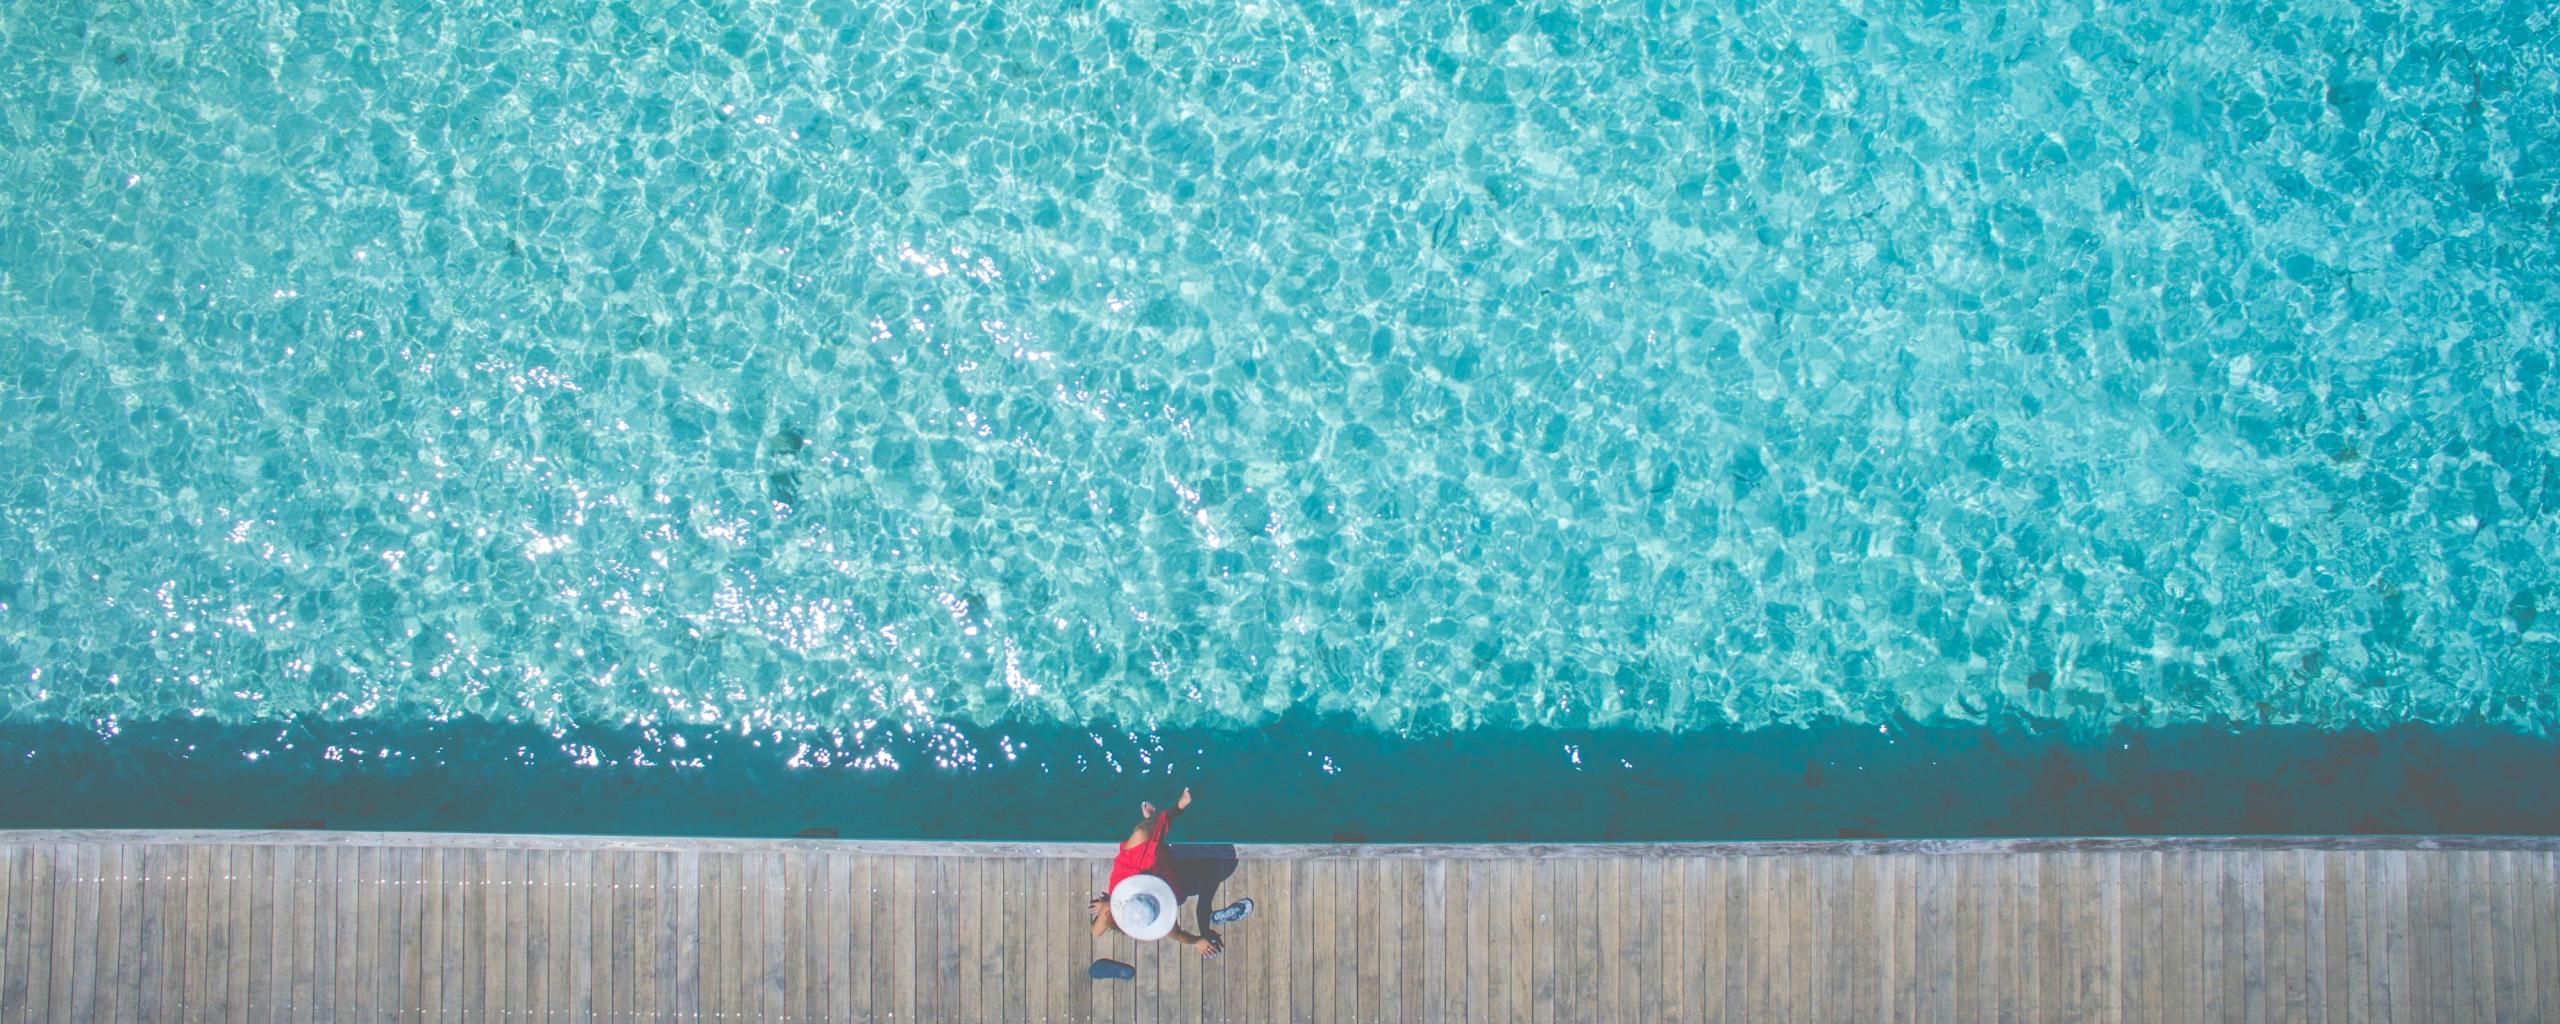 2560x1024 wallpaper Enjoying day, swimming pool, aerial view, summer holiday